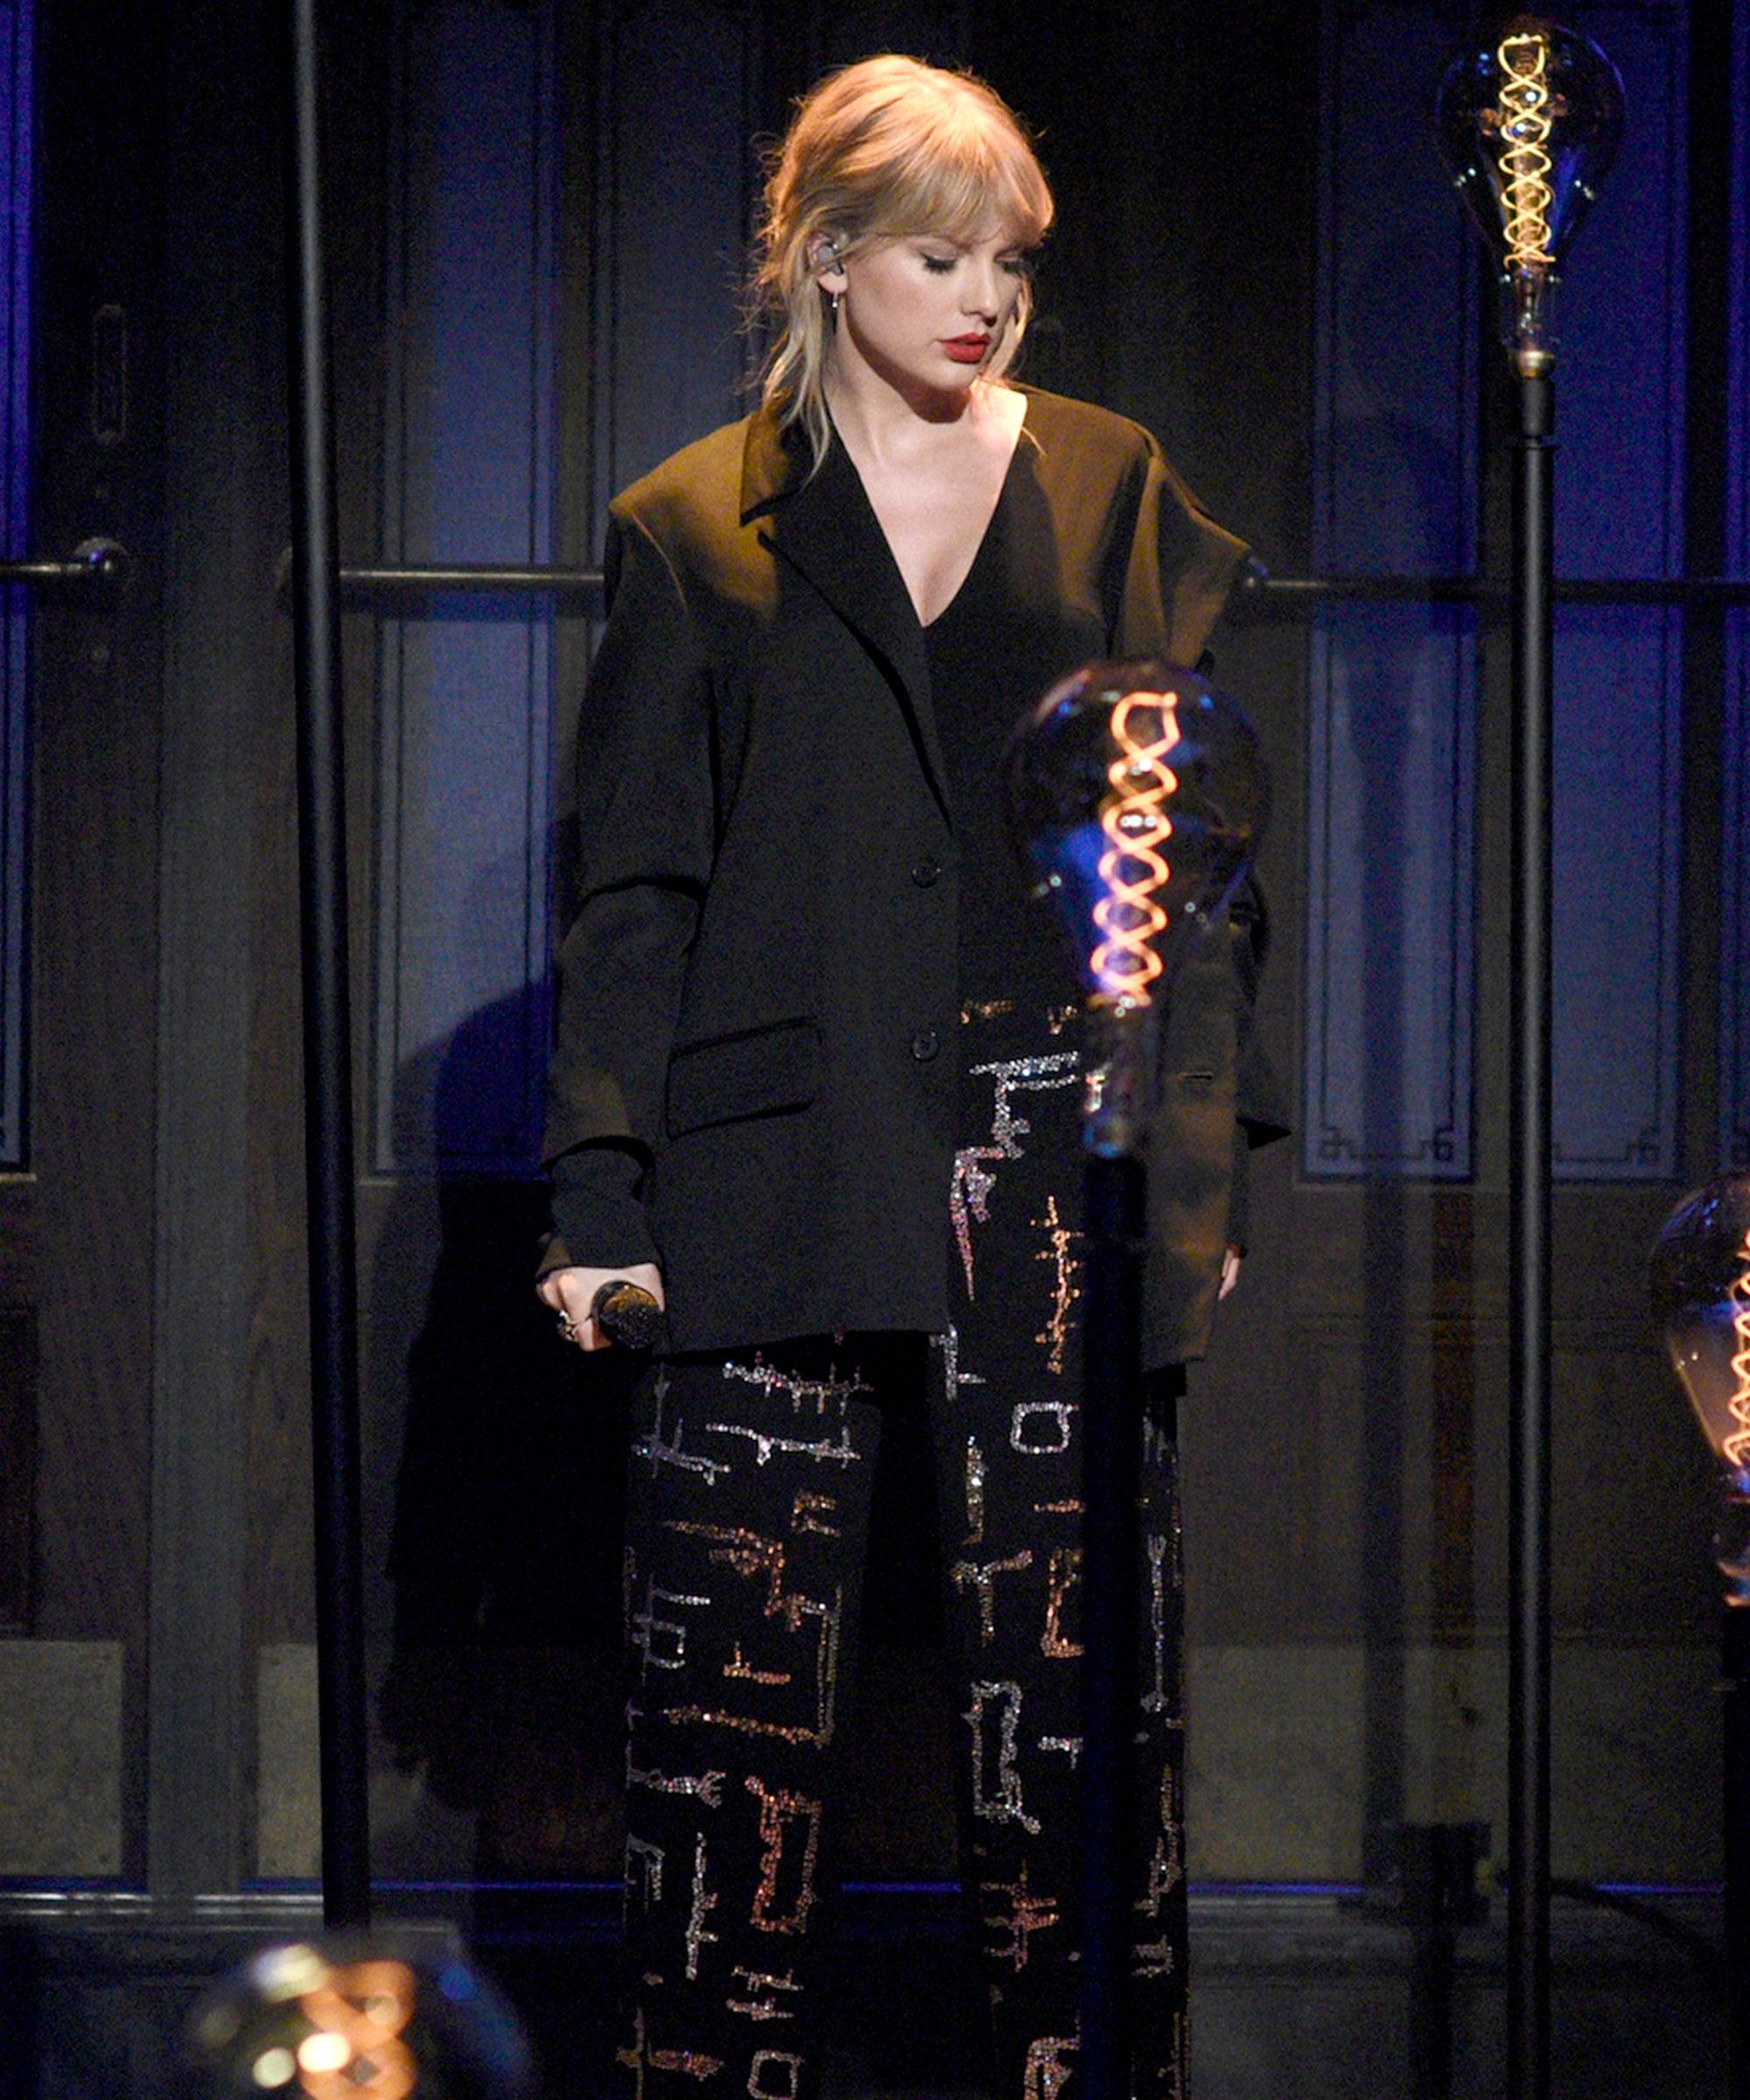 Taylor Swift Saturday Night Live Perfs Lover, False God